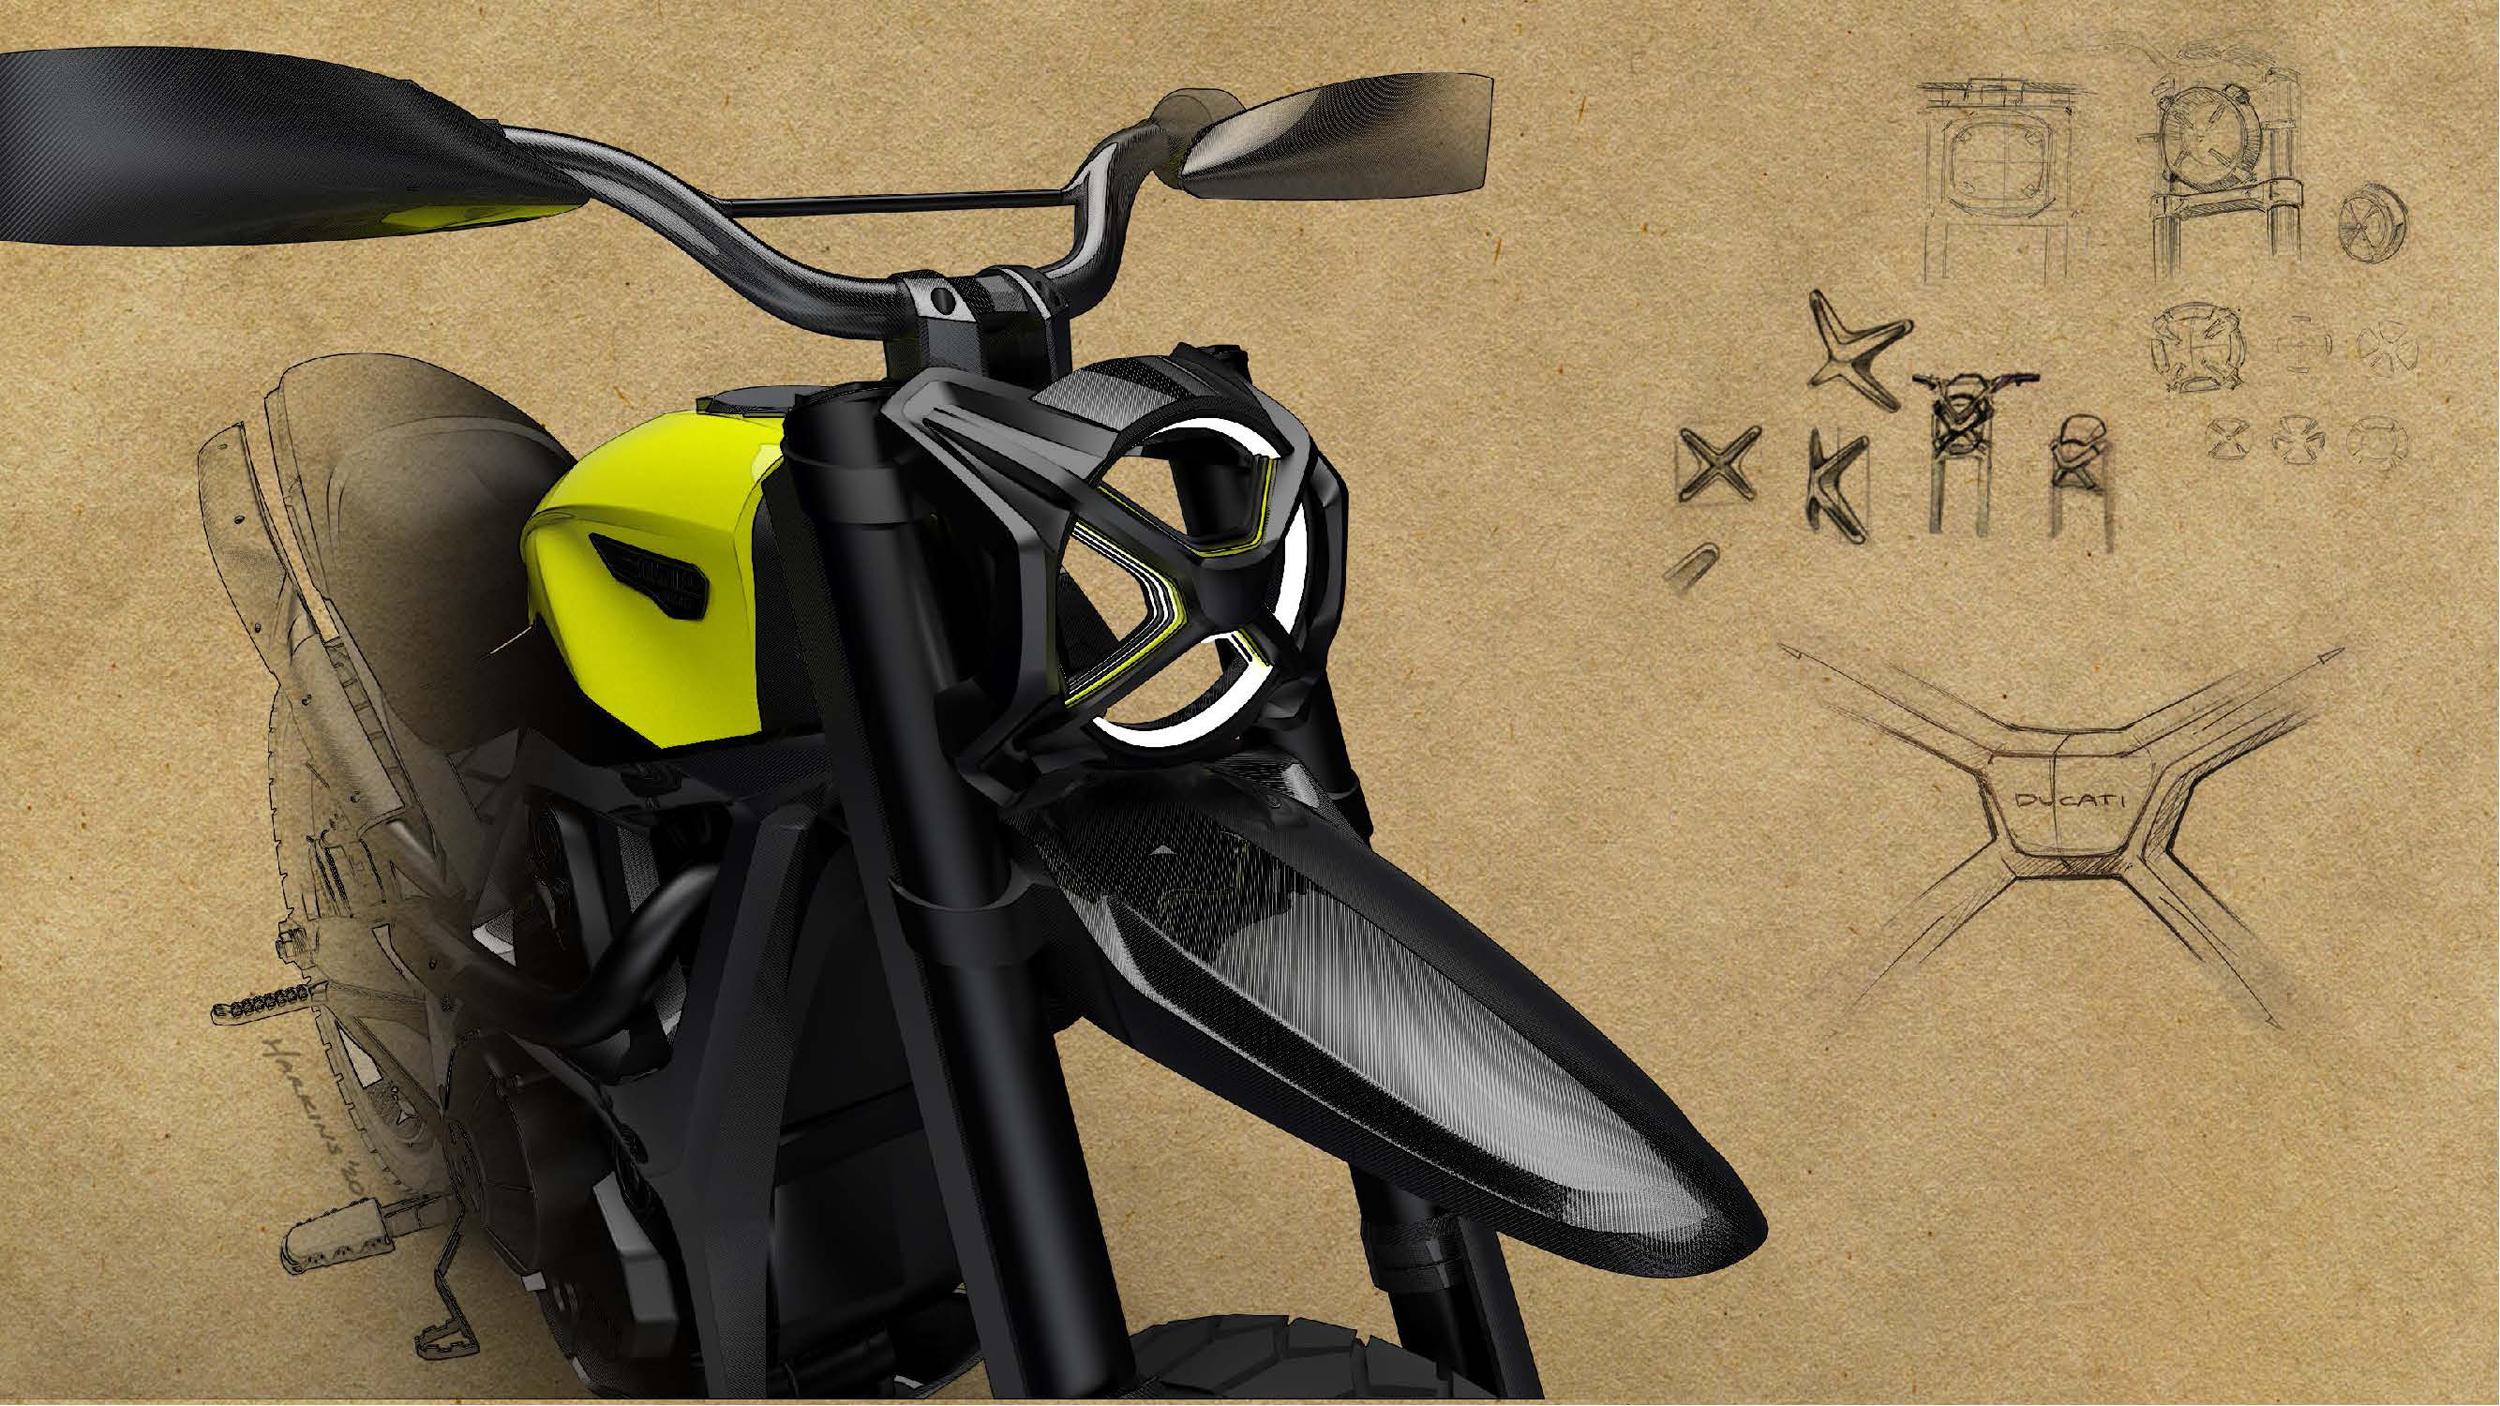 200511 Scrambler Ducati of the future - sketches by Peter Harkins (2)